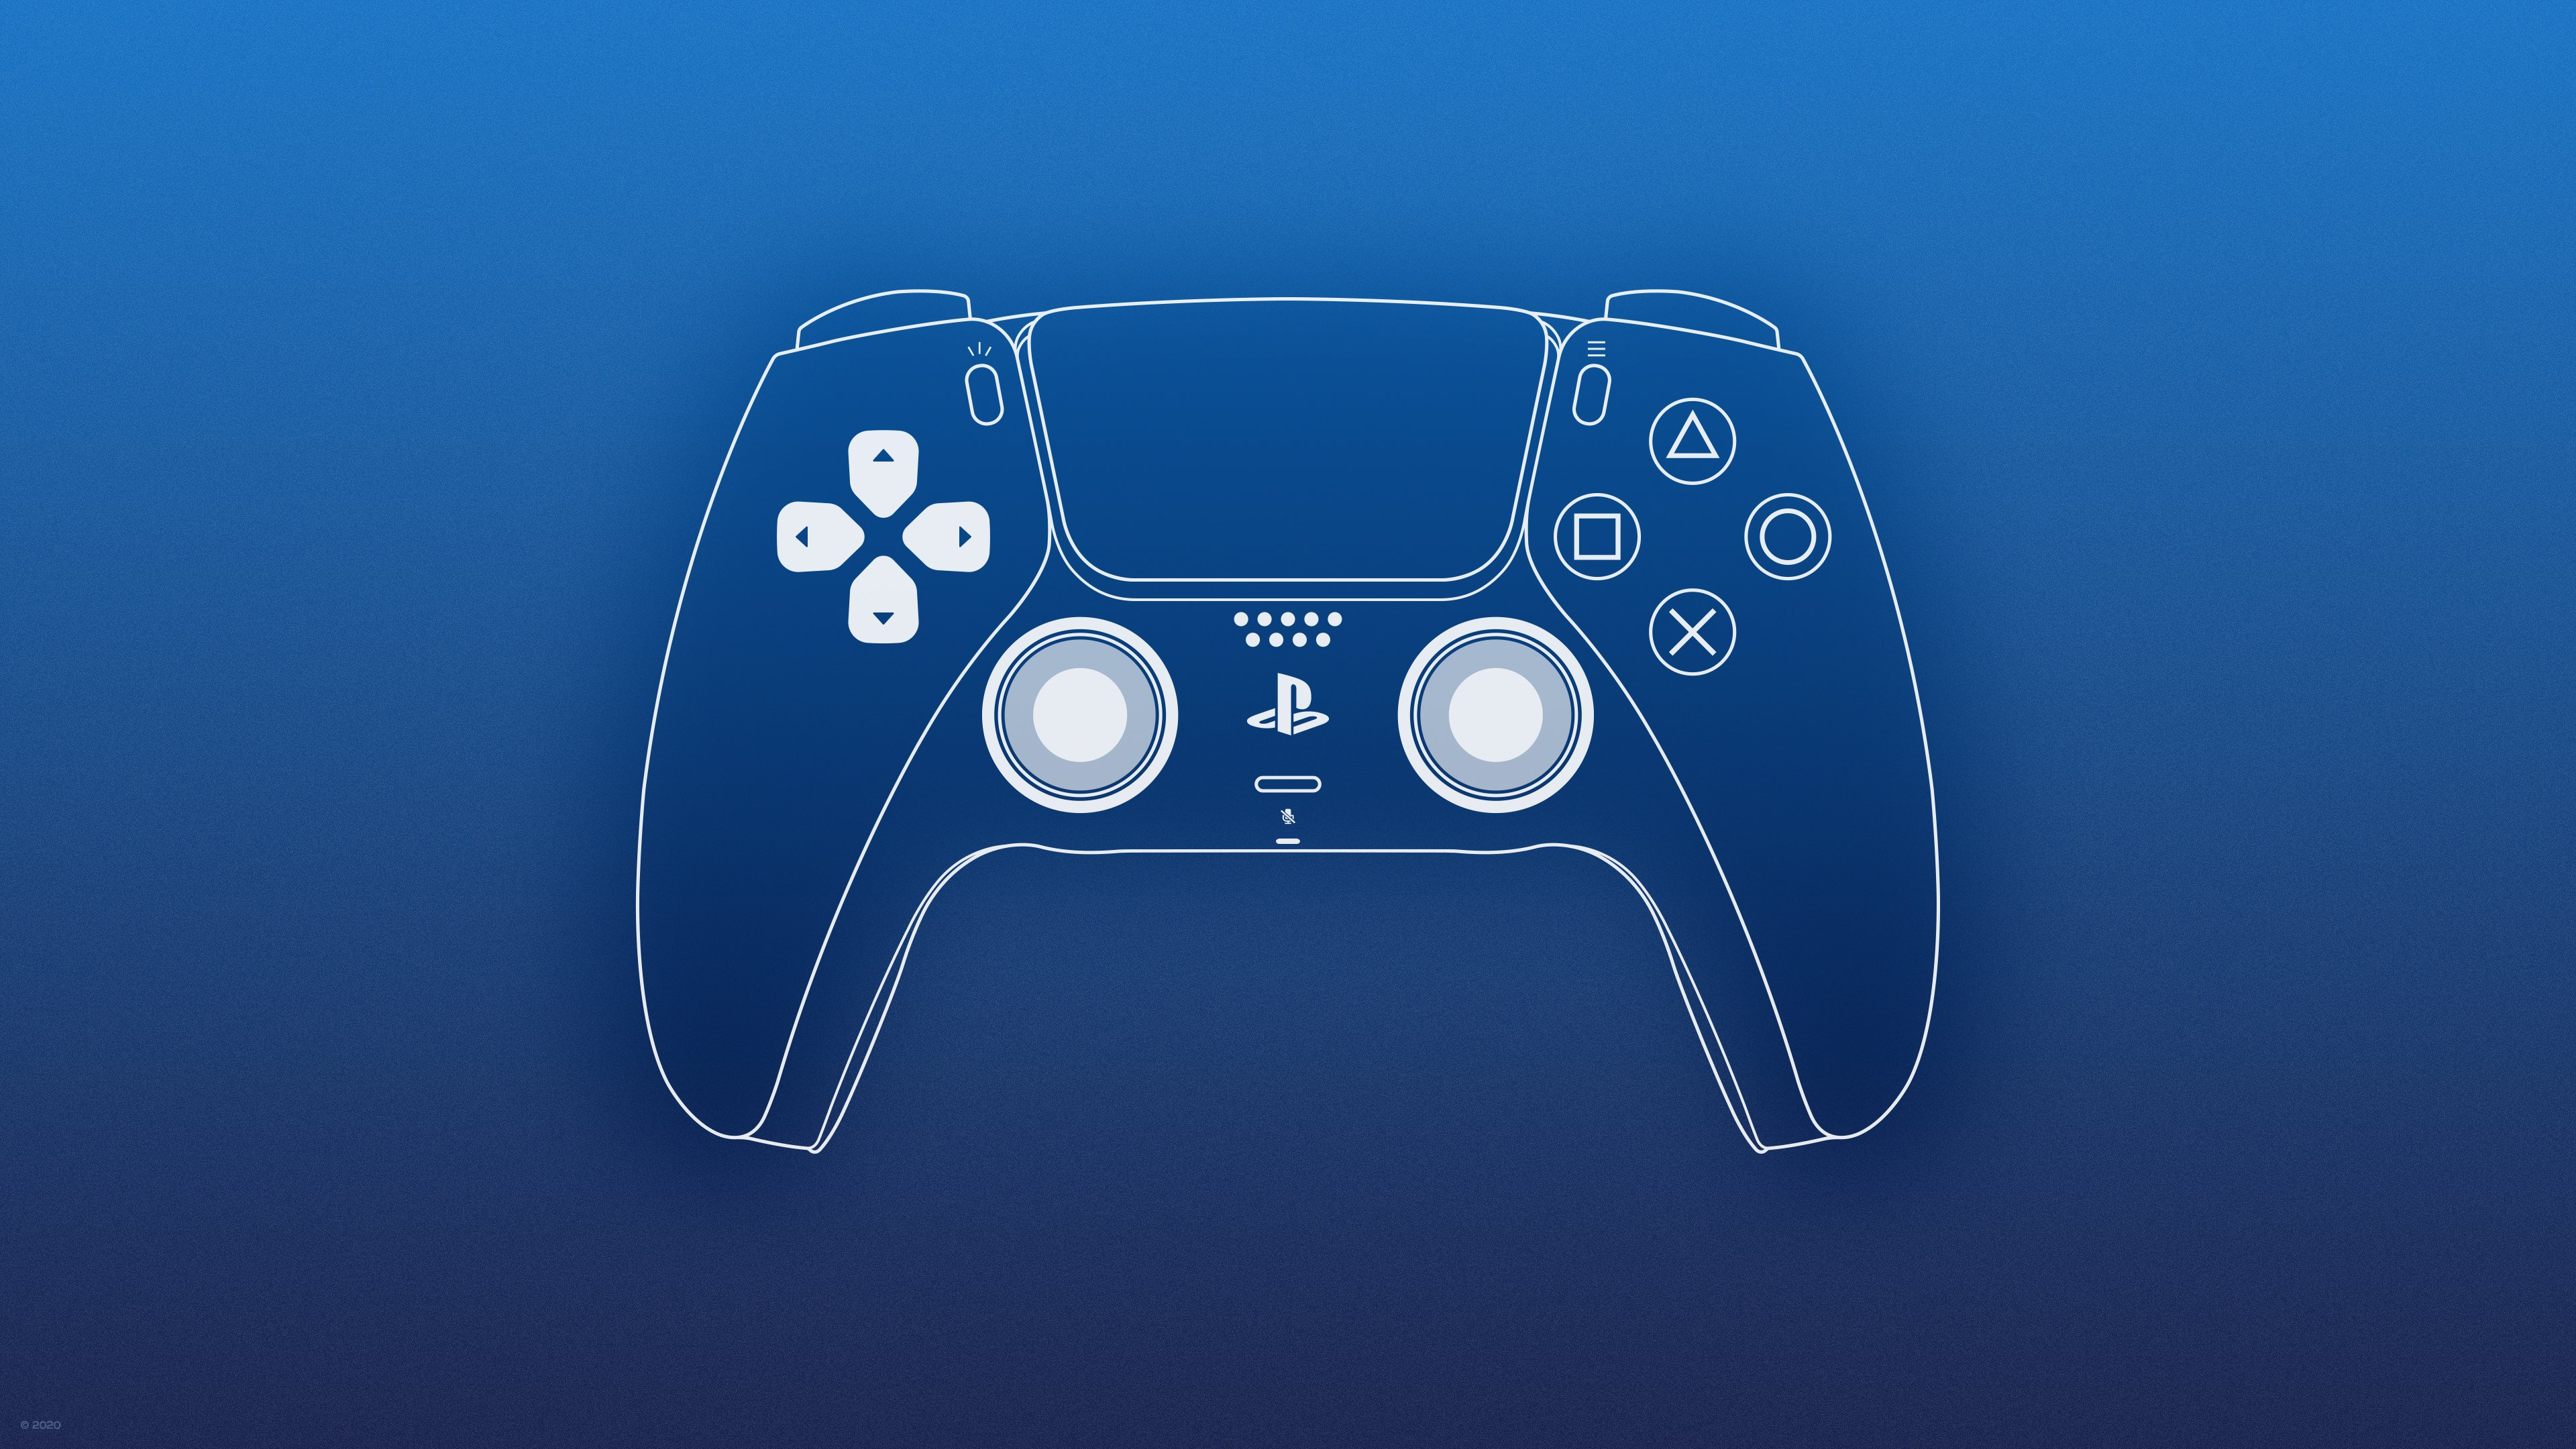 PlayStation 5 DualSense Wallpaper by ljdesigner 3840x2160